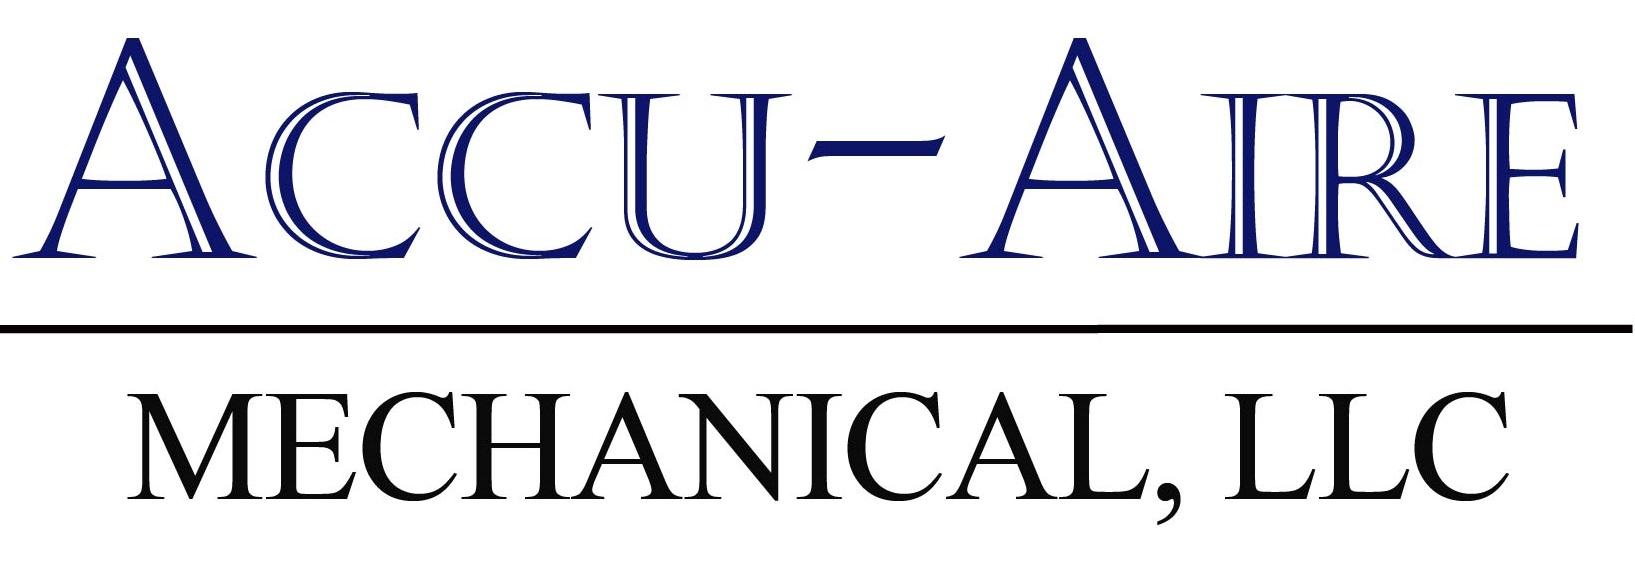 Accu-Aire Mechanical